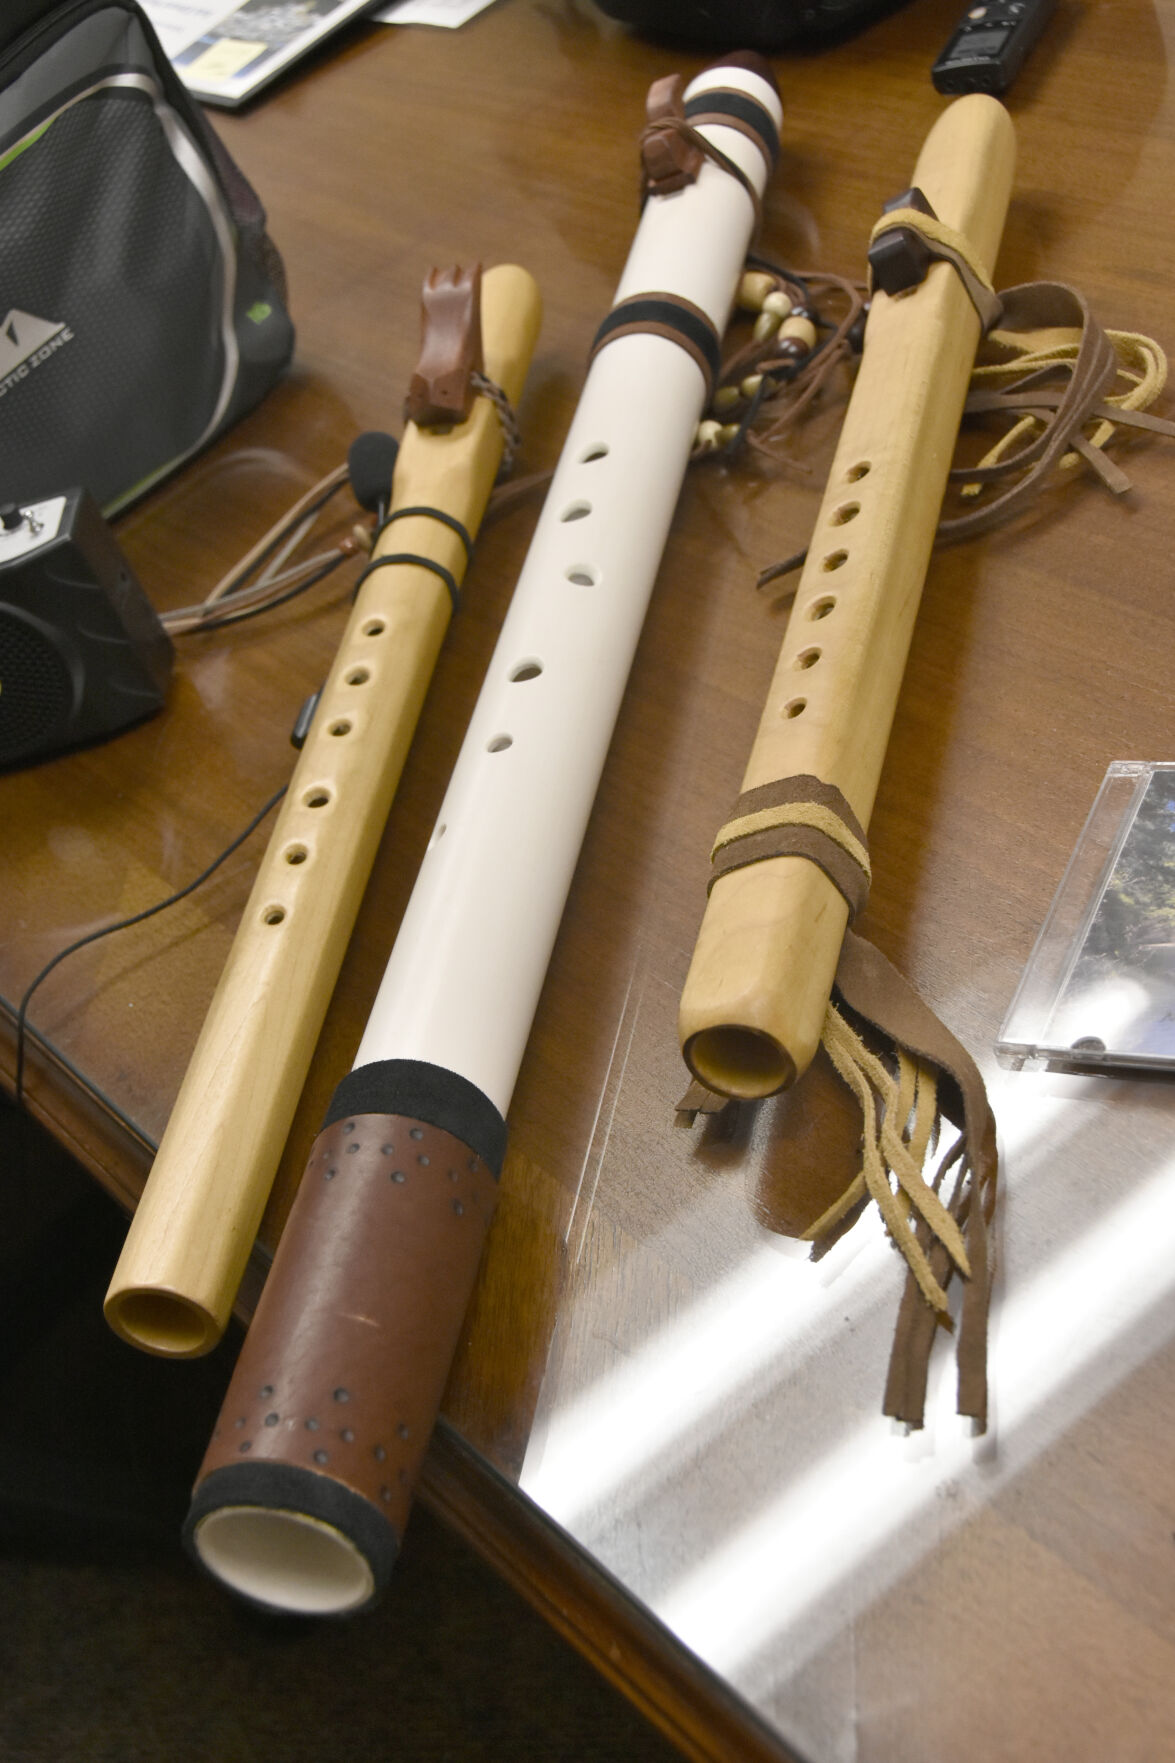 Kevin Ashley flutes